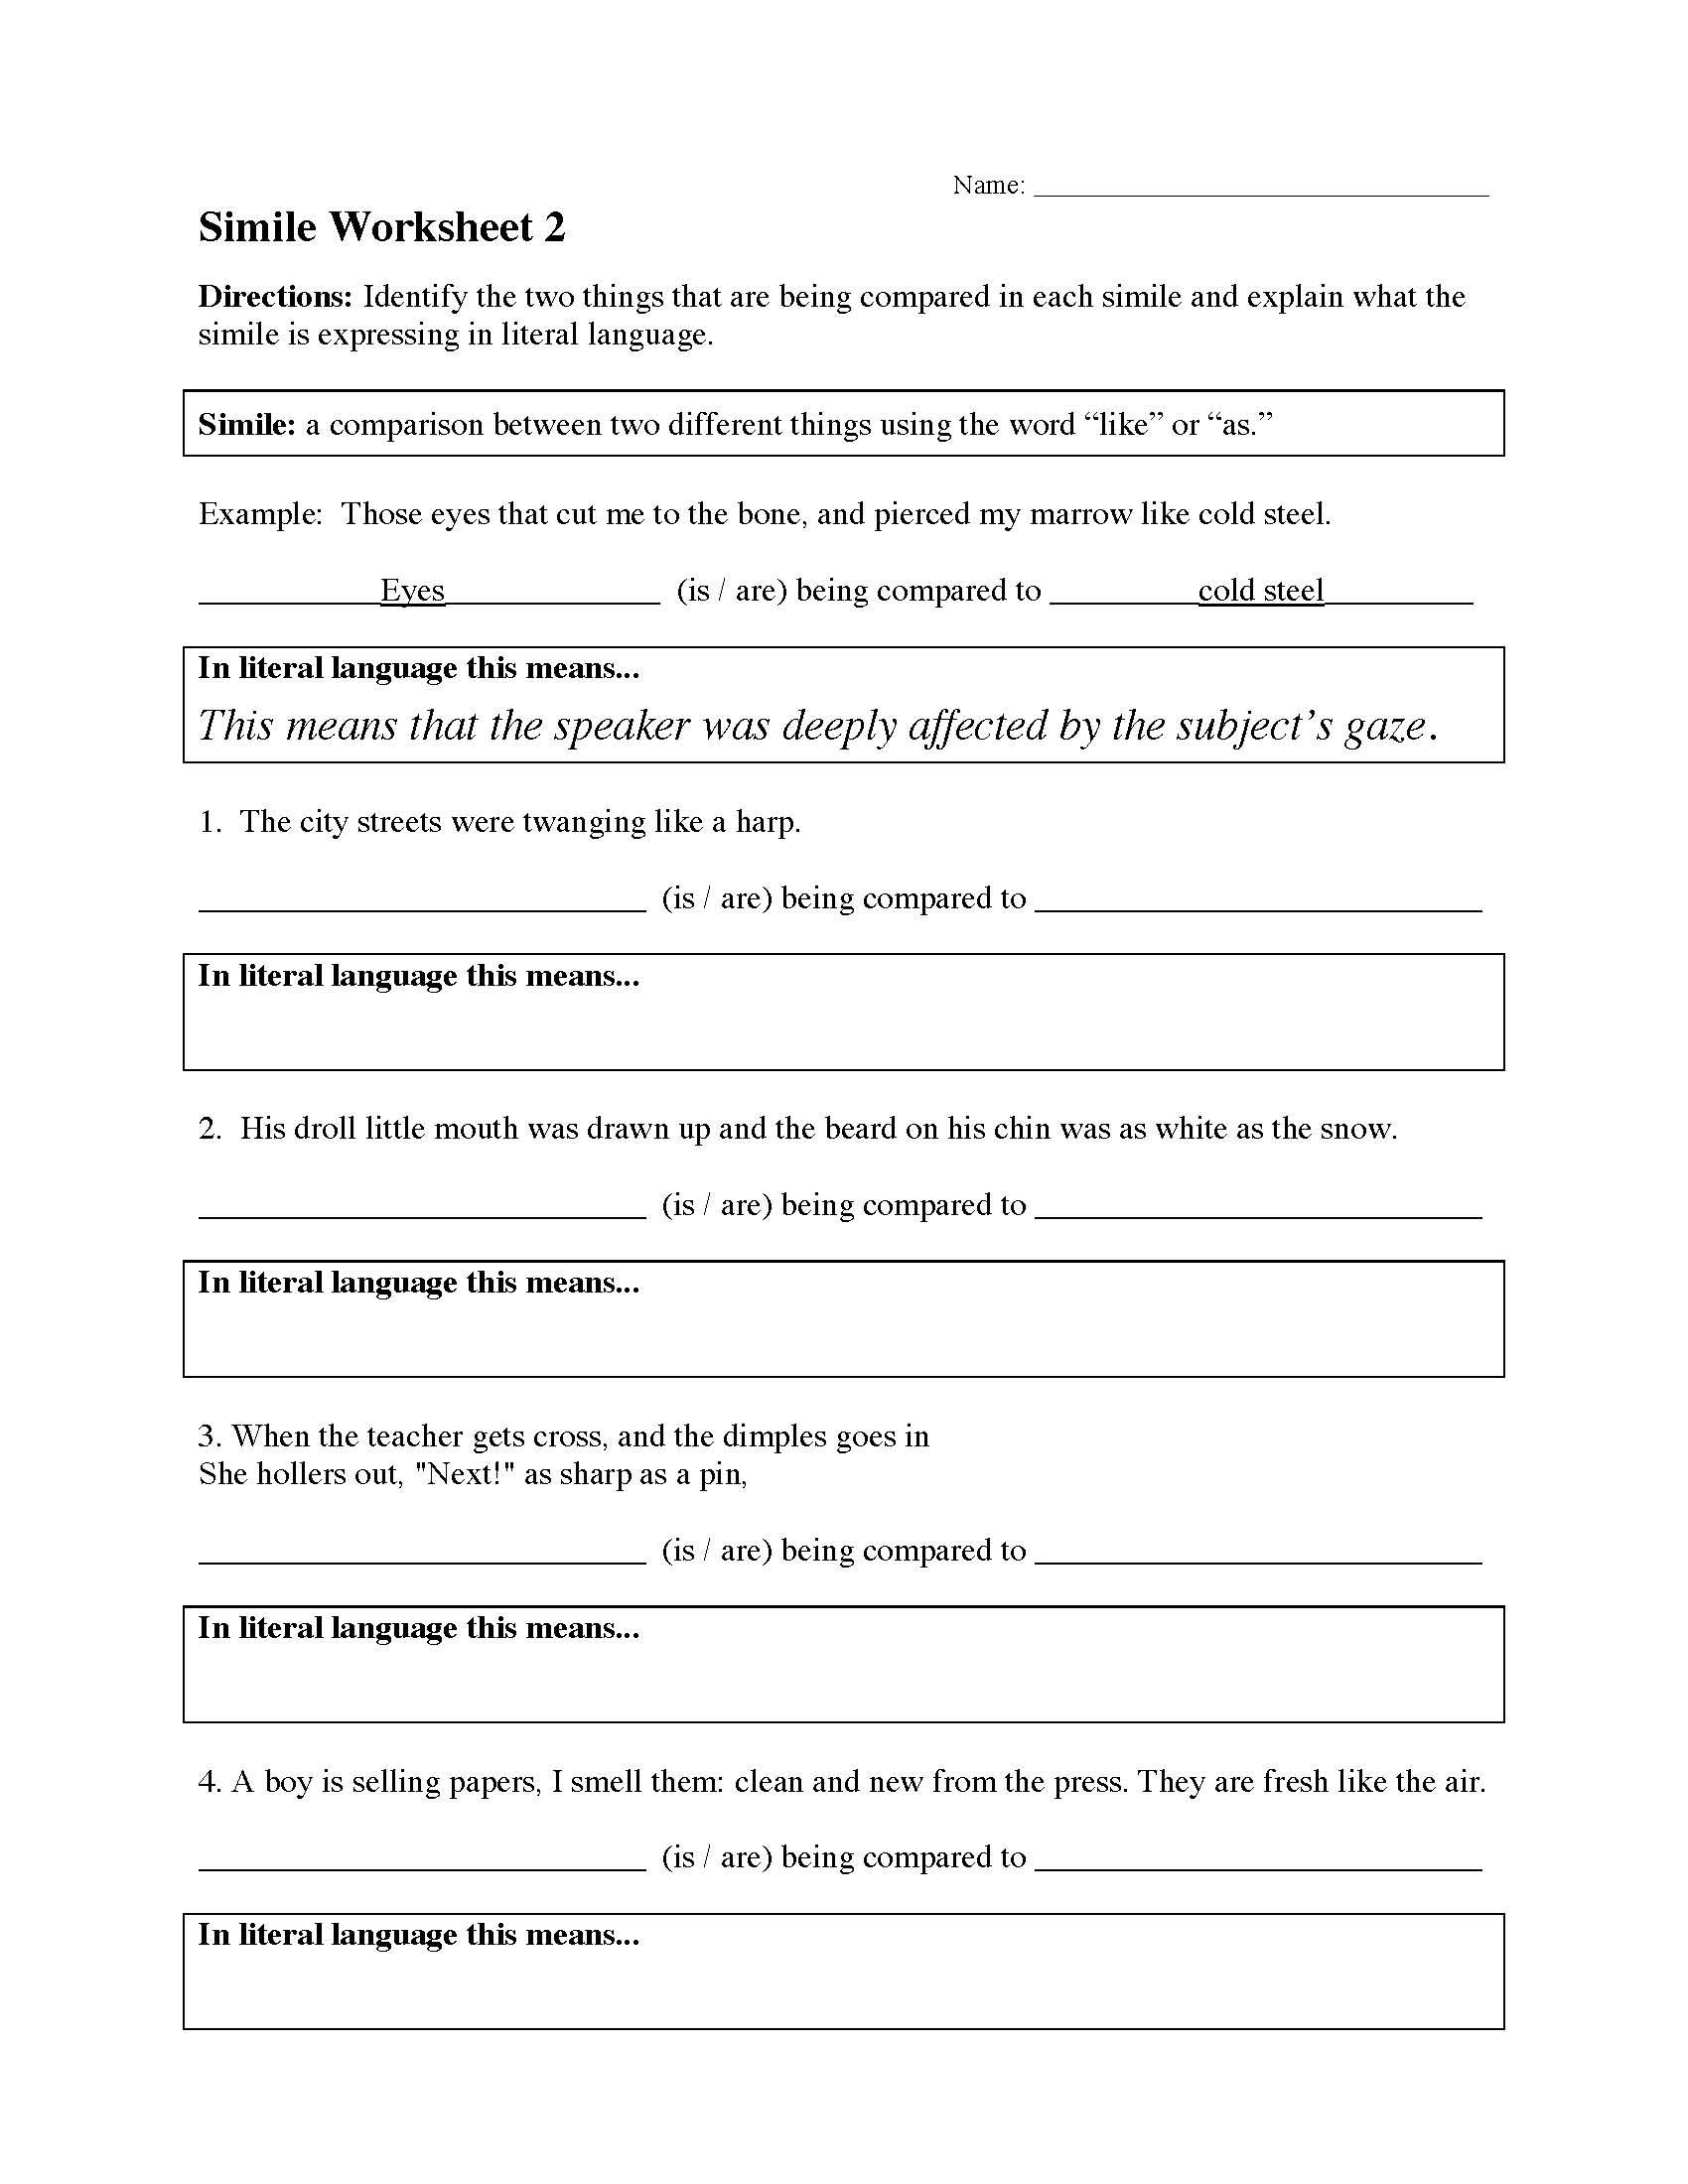 Simile Worksheet 2